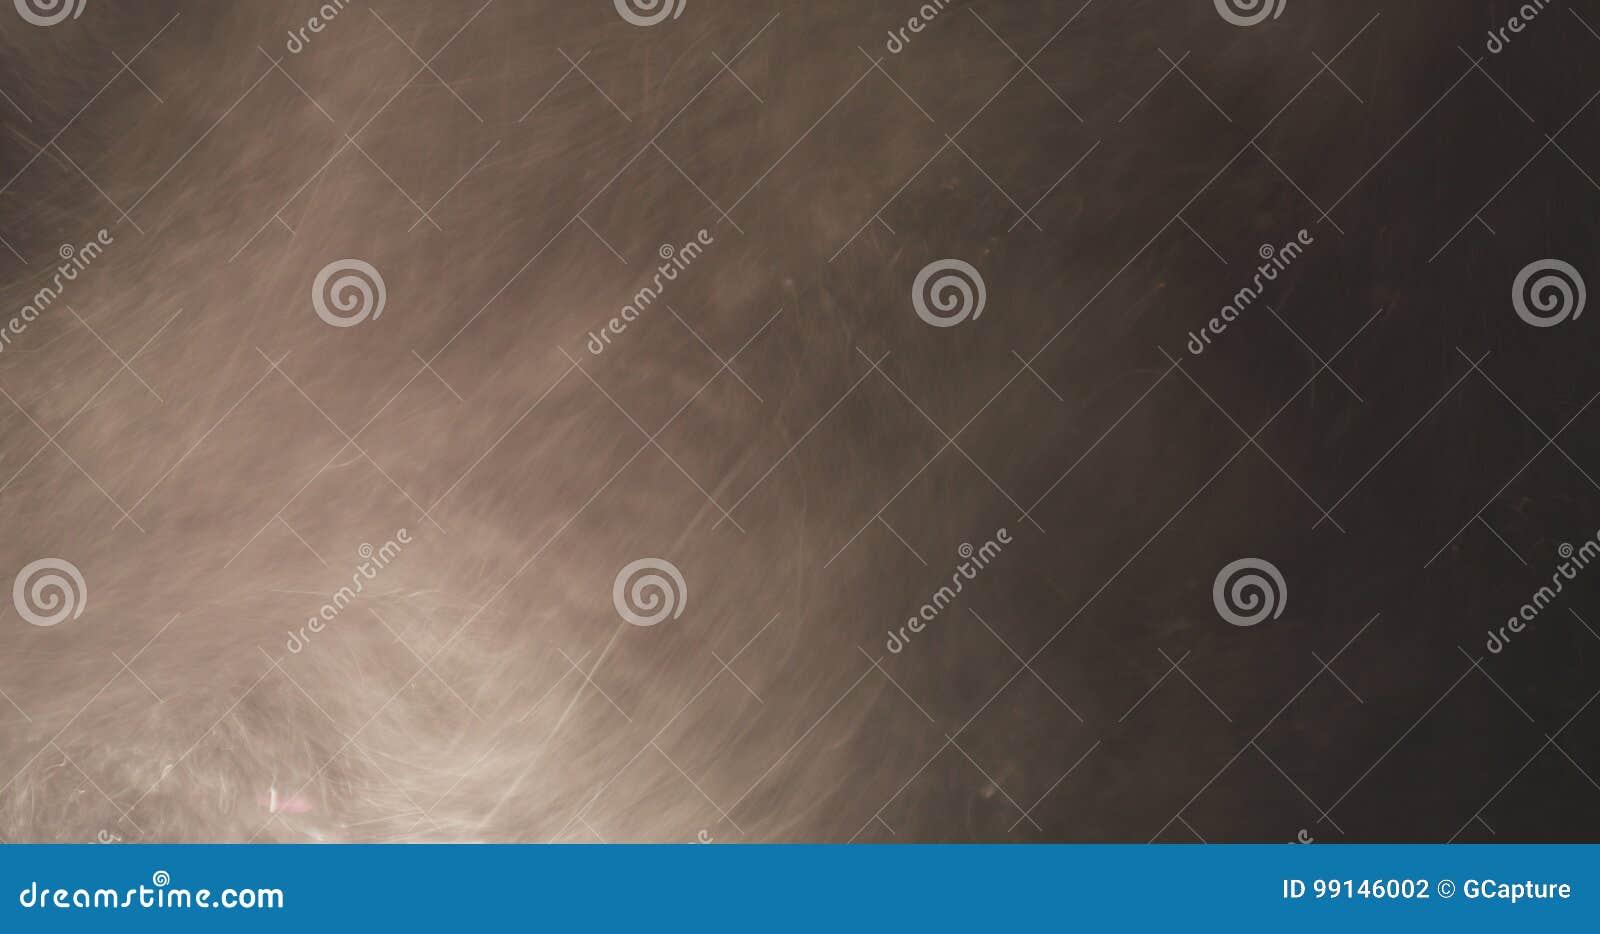 Macro shot of sand dust explosive flow for overlay